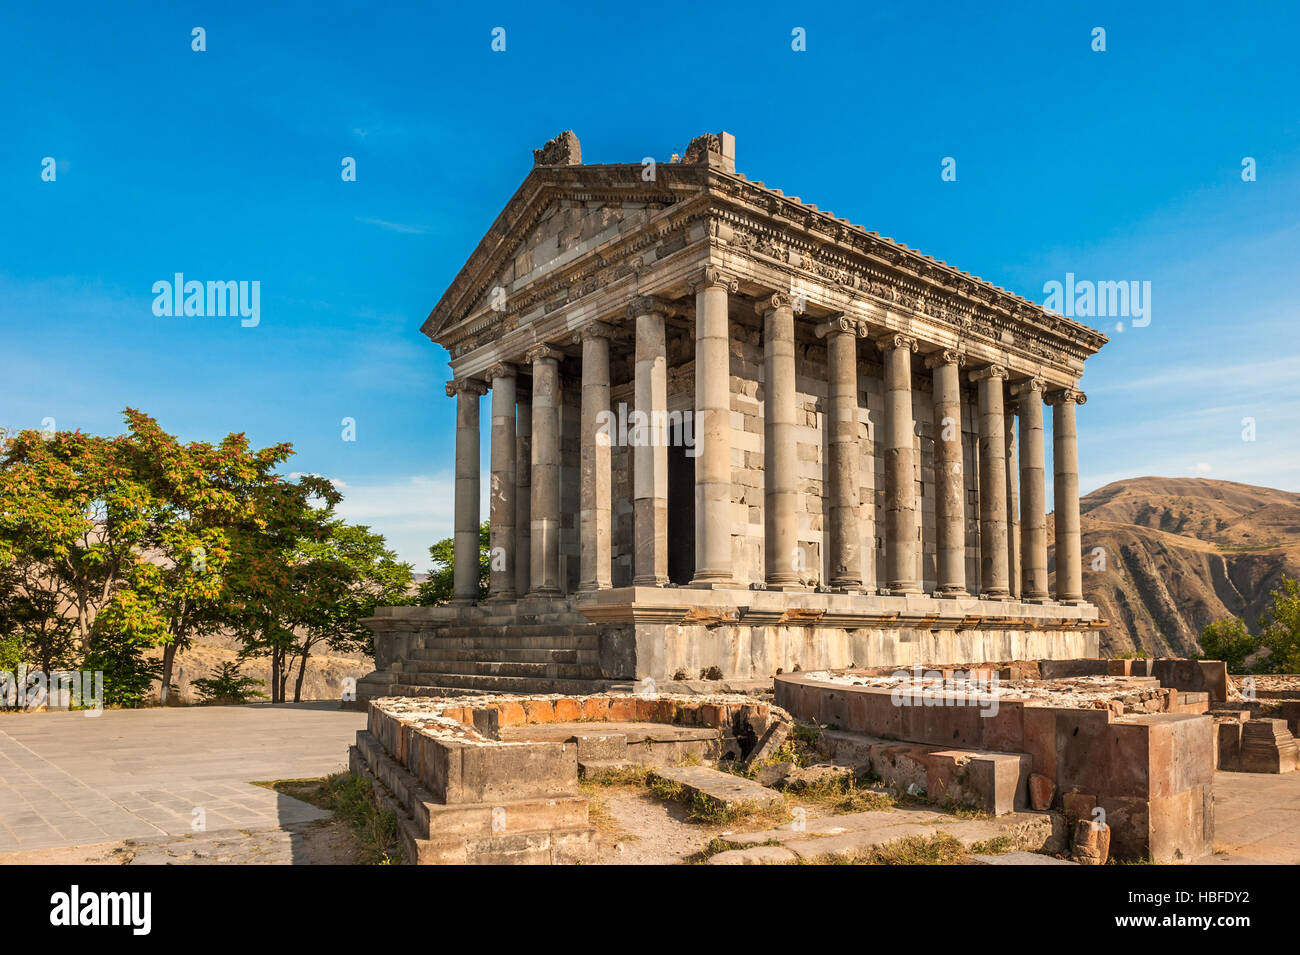 The Hellenic temple of Garni in Armenia - Stock Image